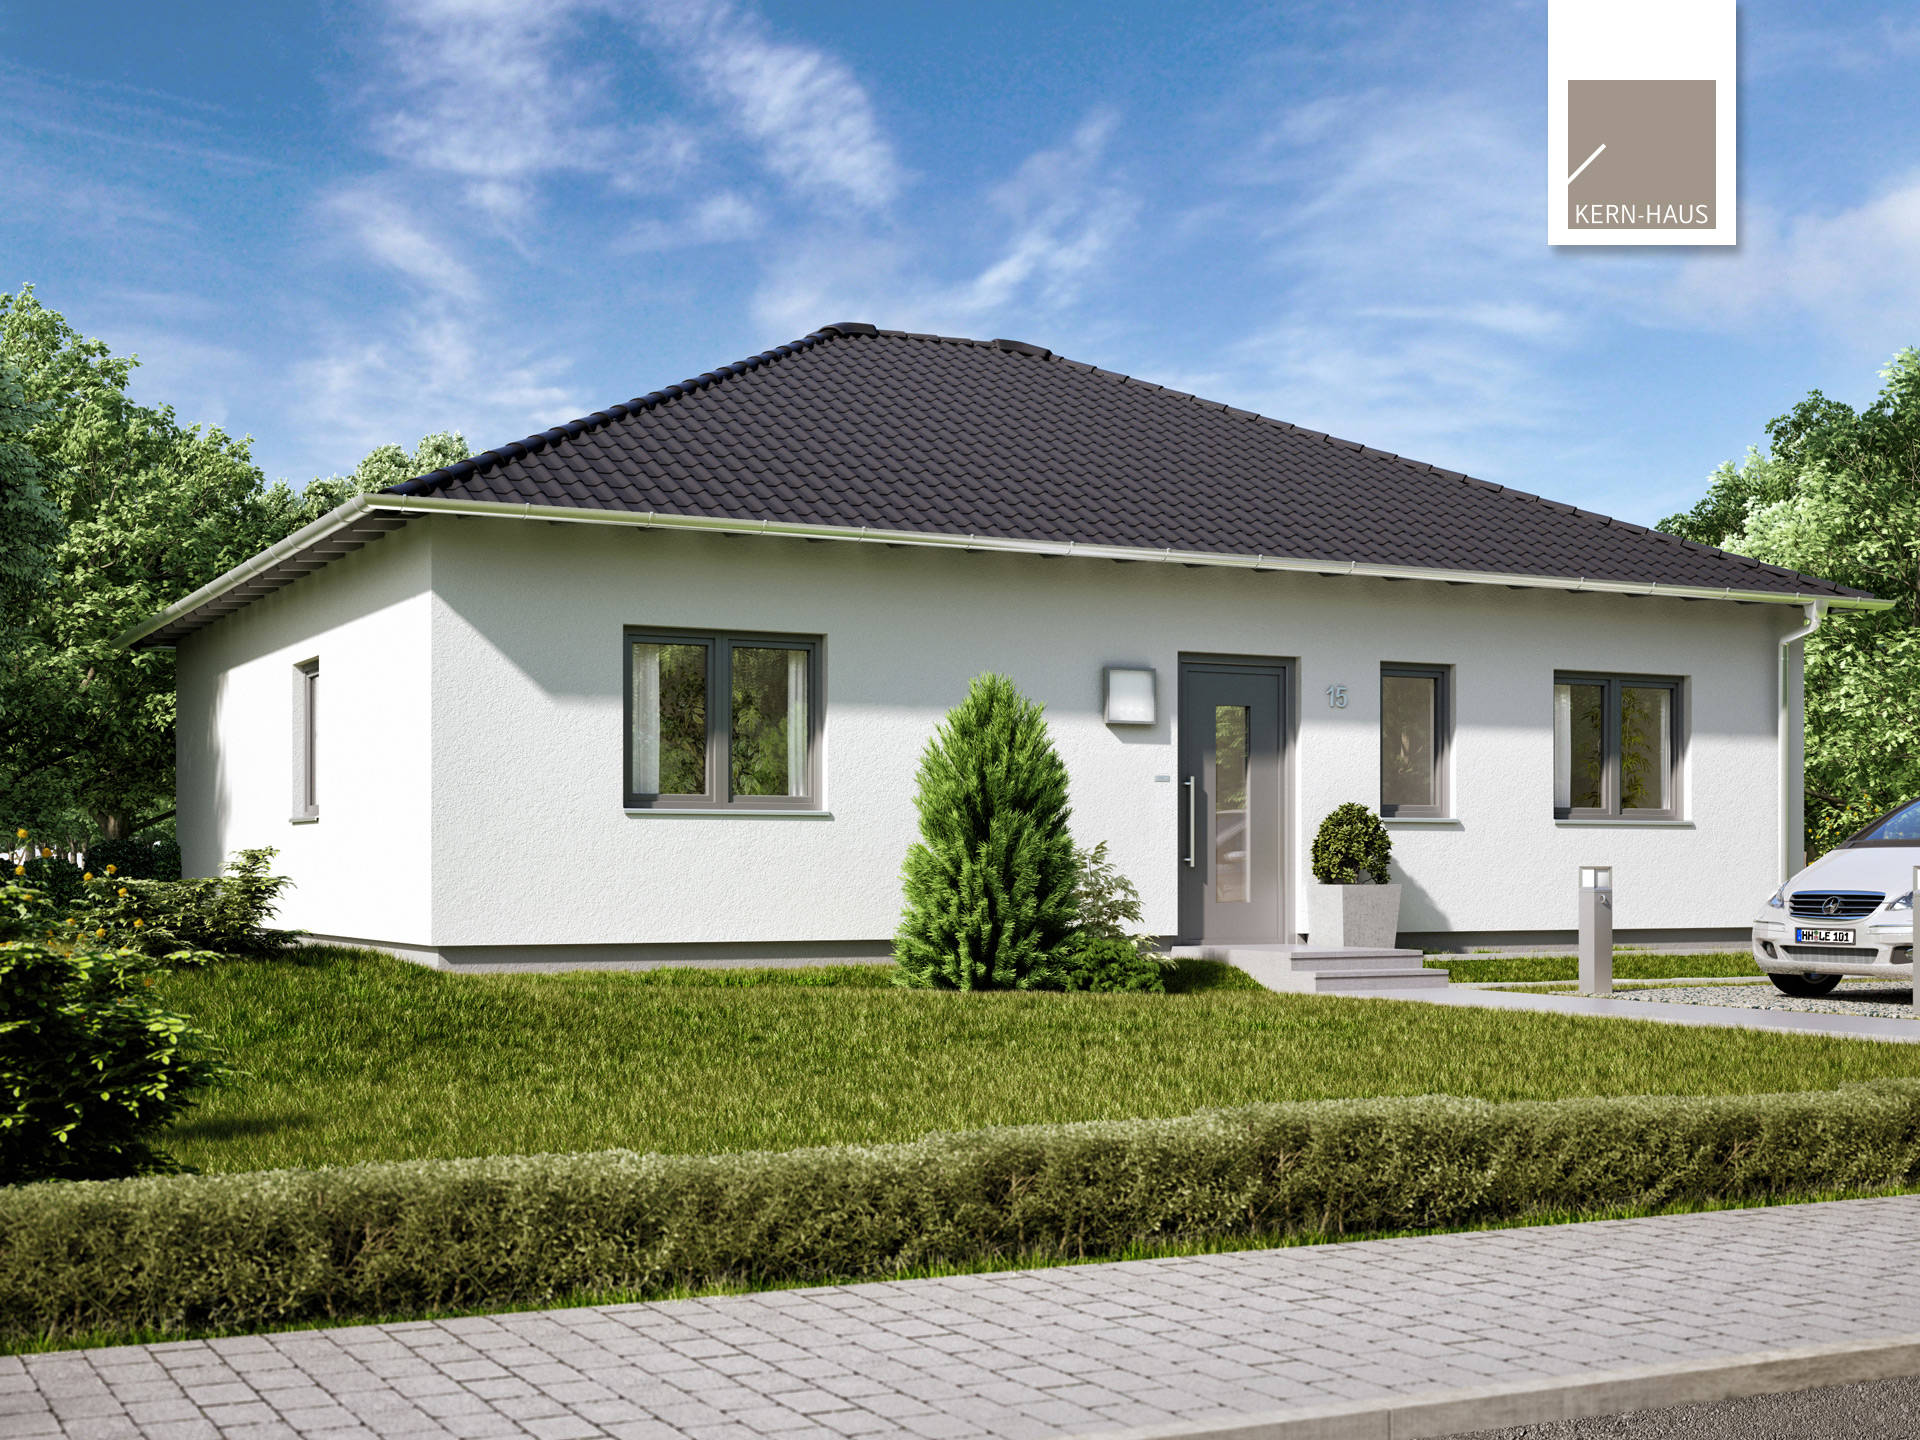 Bungalow Flair - Kern-Haus | Musterhaus.net